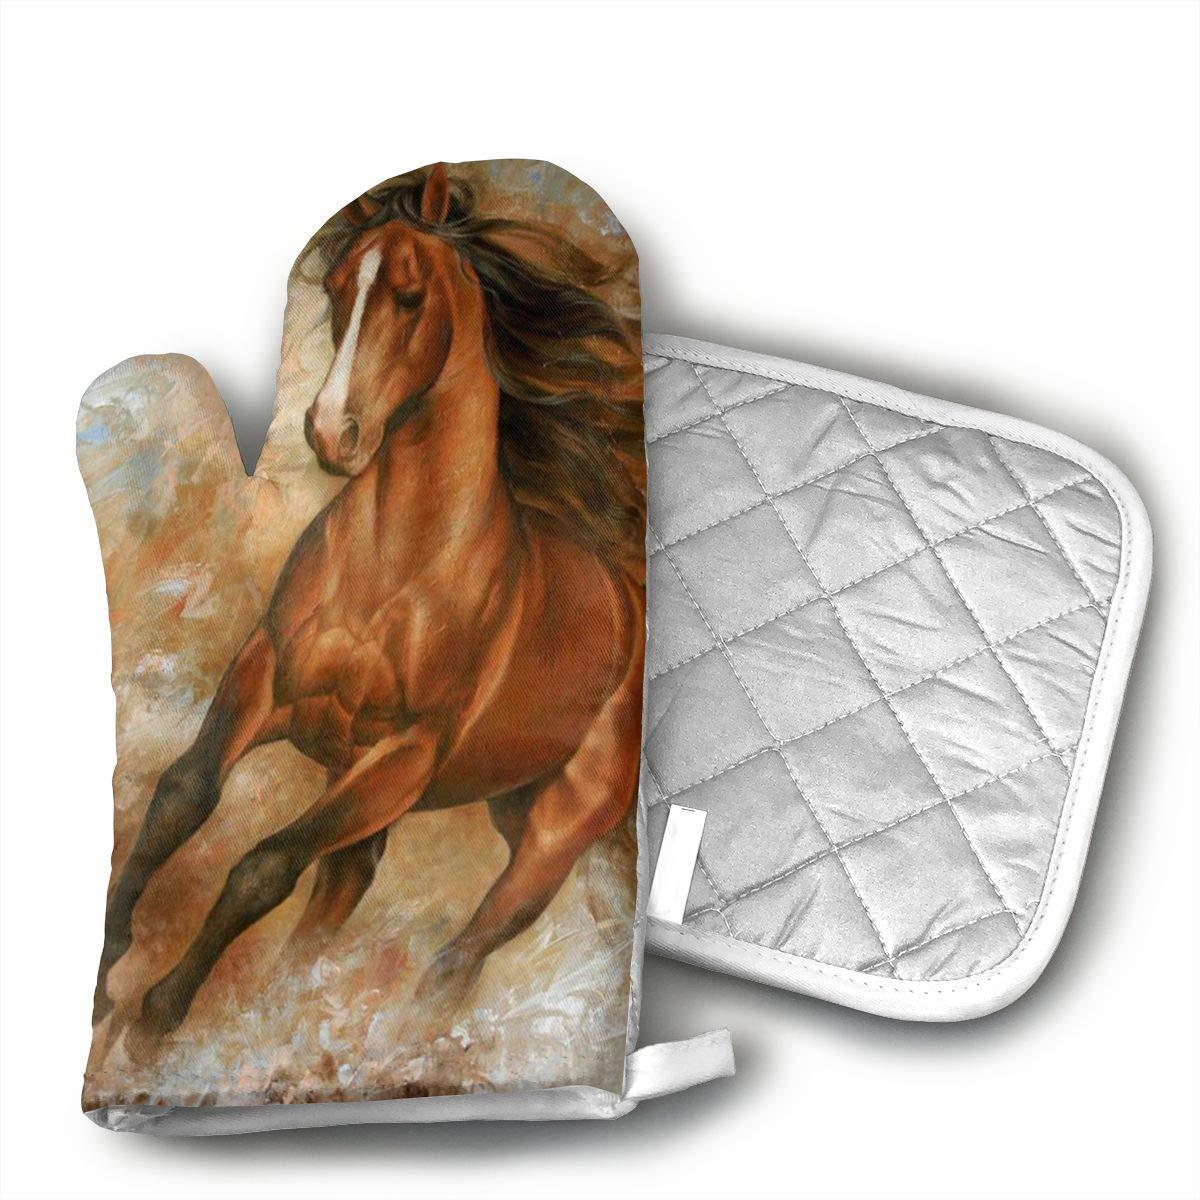 CASM Oil Painting Horse Premium Terylene/Nylon Oven Mitts and Pot mat,Pot mat/Hot Pads, Heat Resistant Gloves BBQ Kitchen